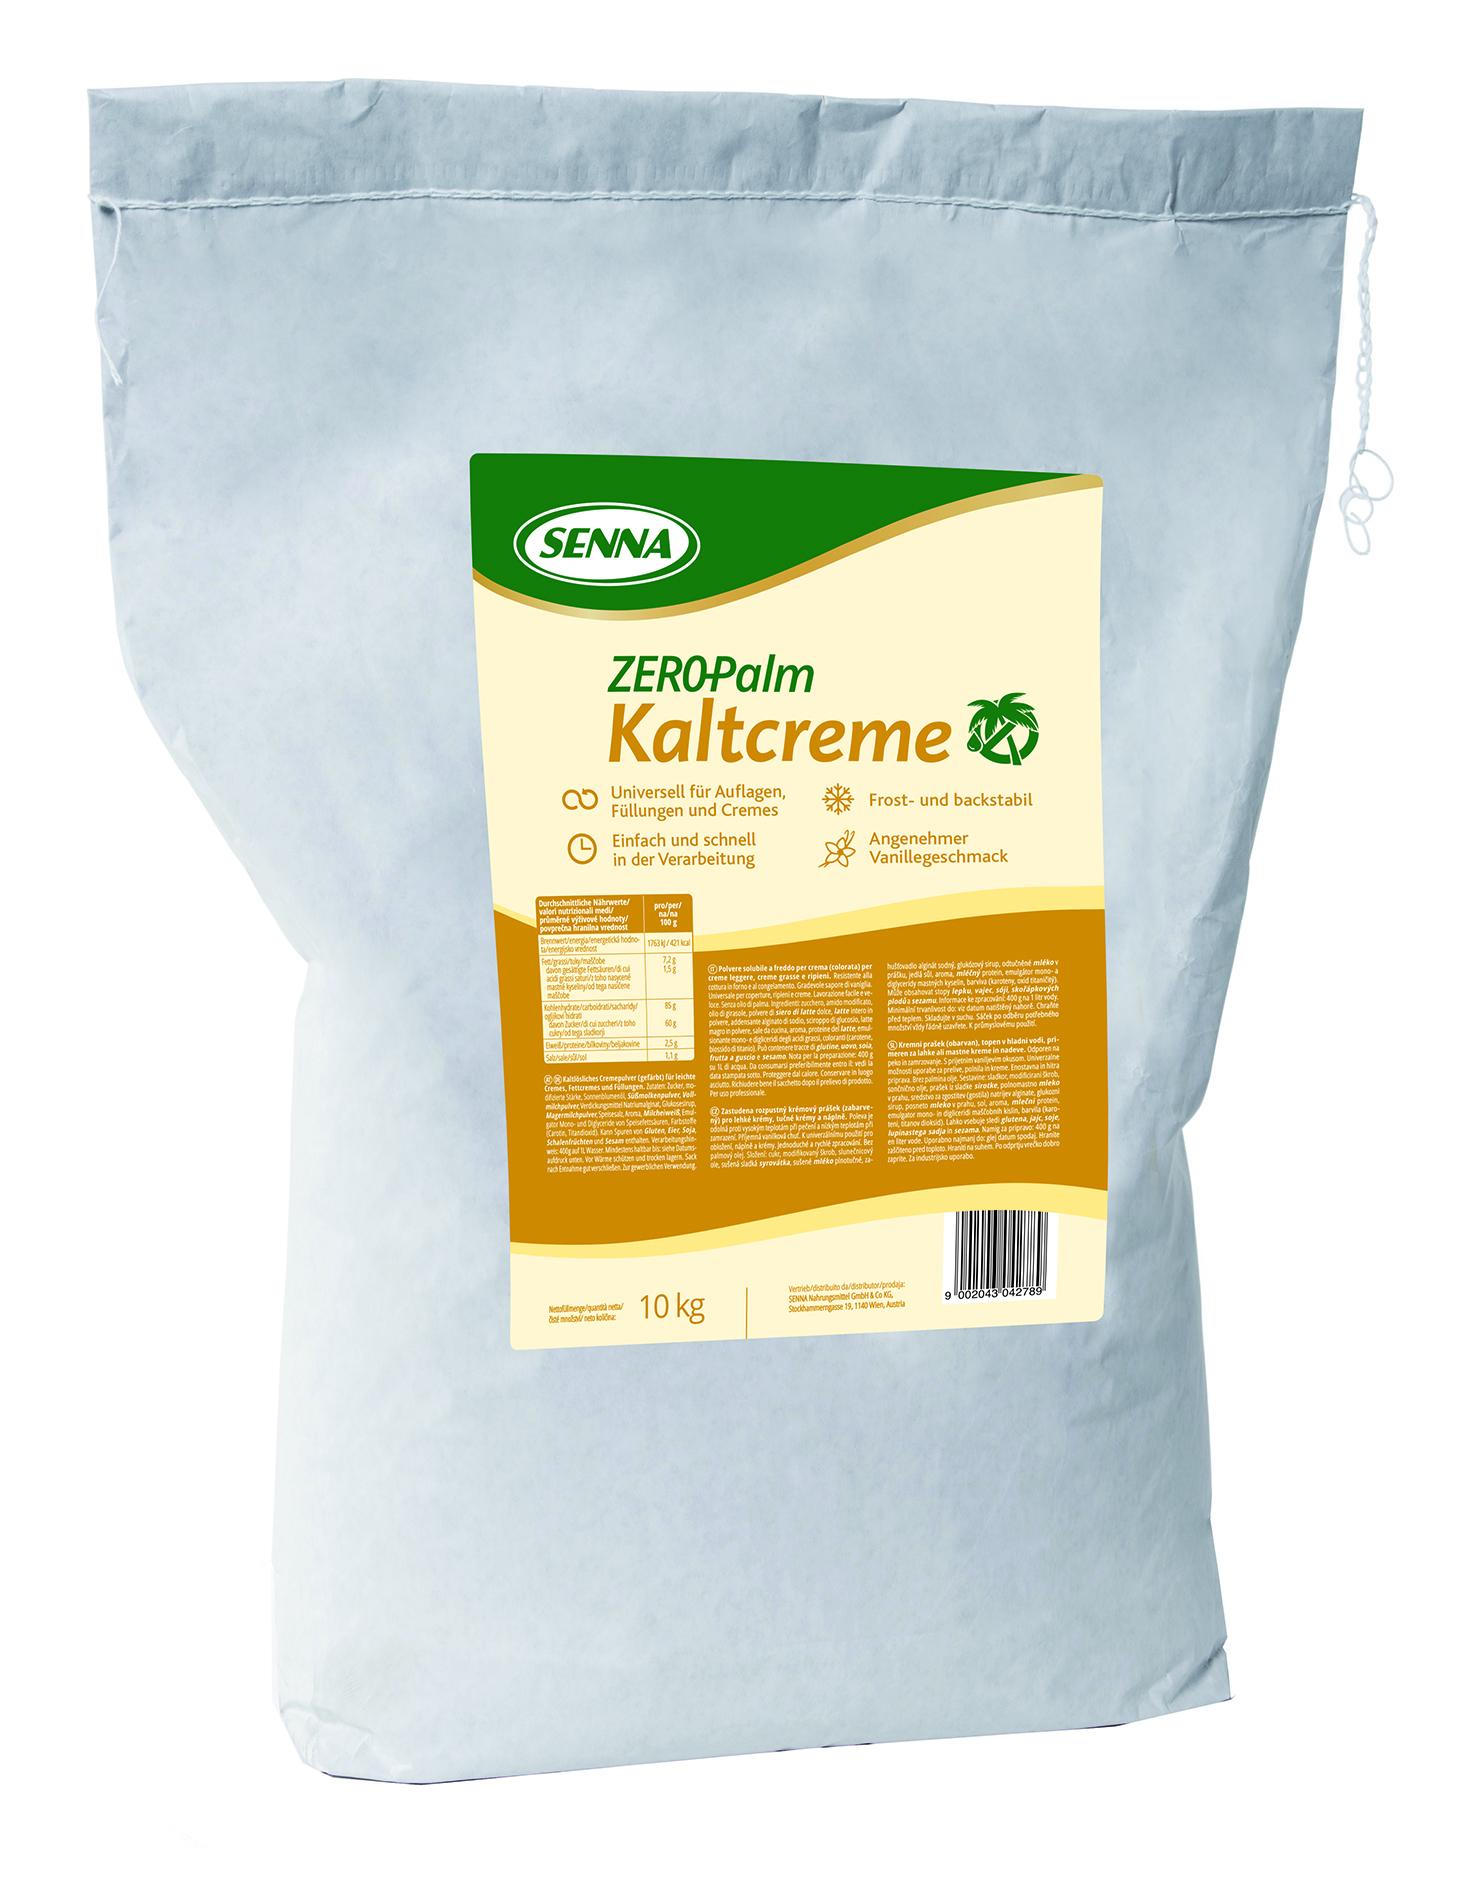 1244212 Senna Kaltcreme Zero Palm